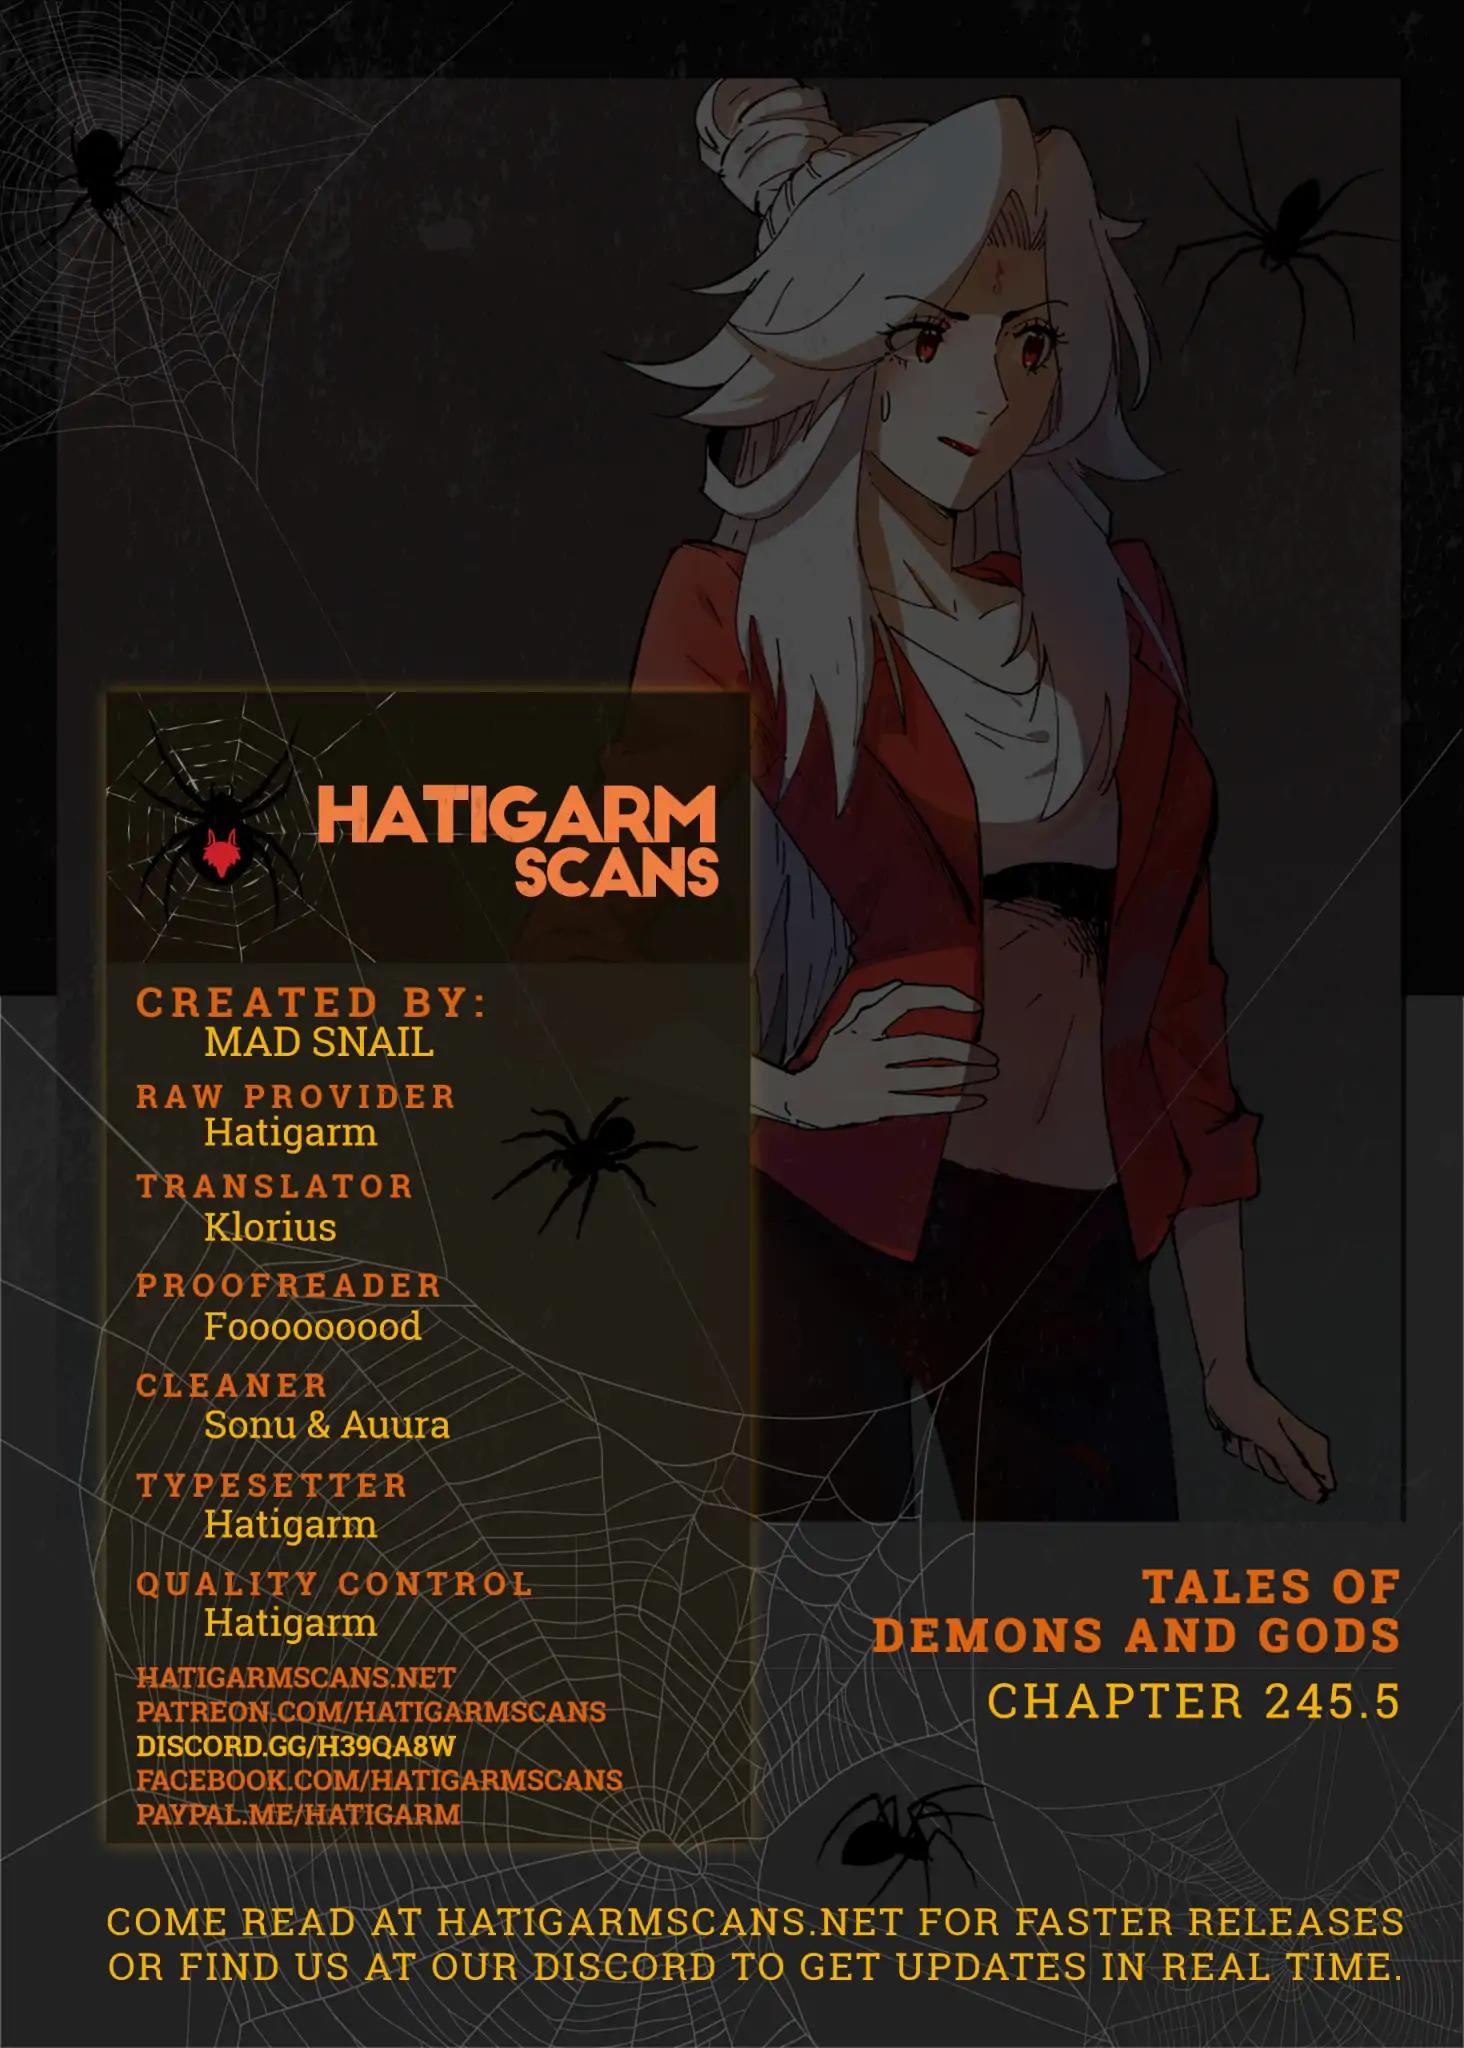 https://manga.mangadogs.com/comics/pic2/34/98/904840/00003e3b9e5336685200ae85d21b4f5e.jpg Page 1